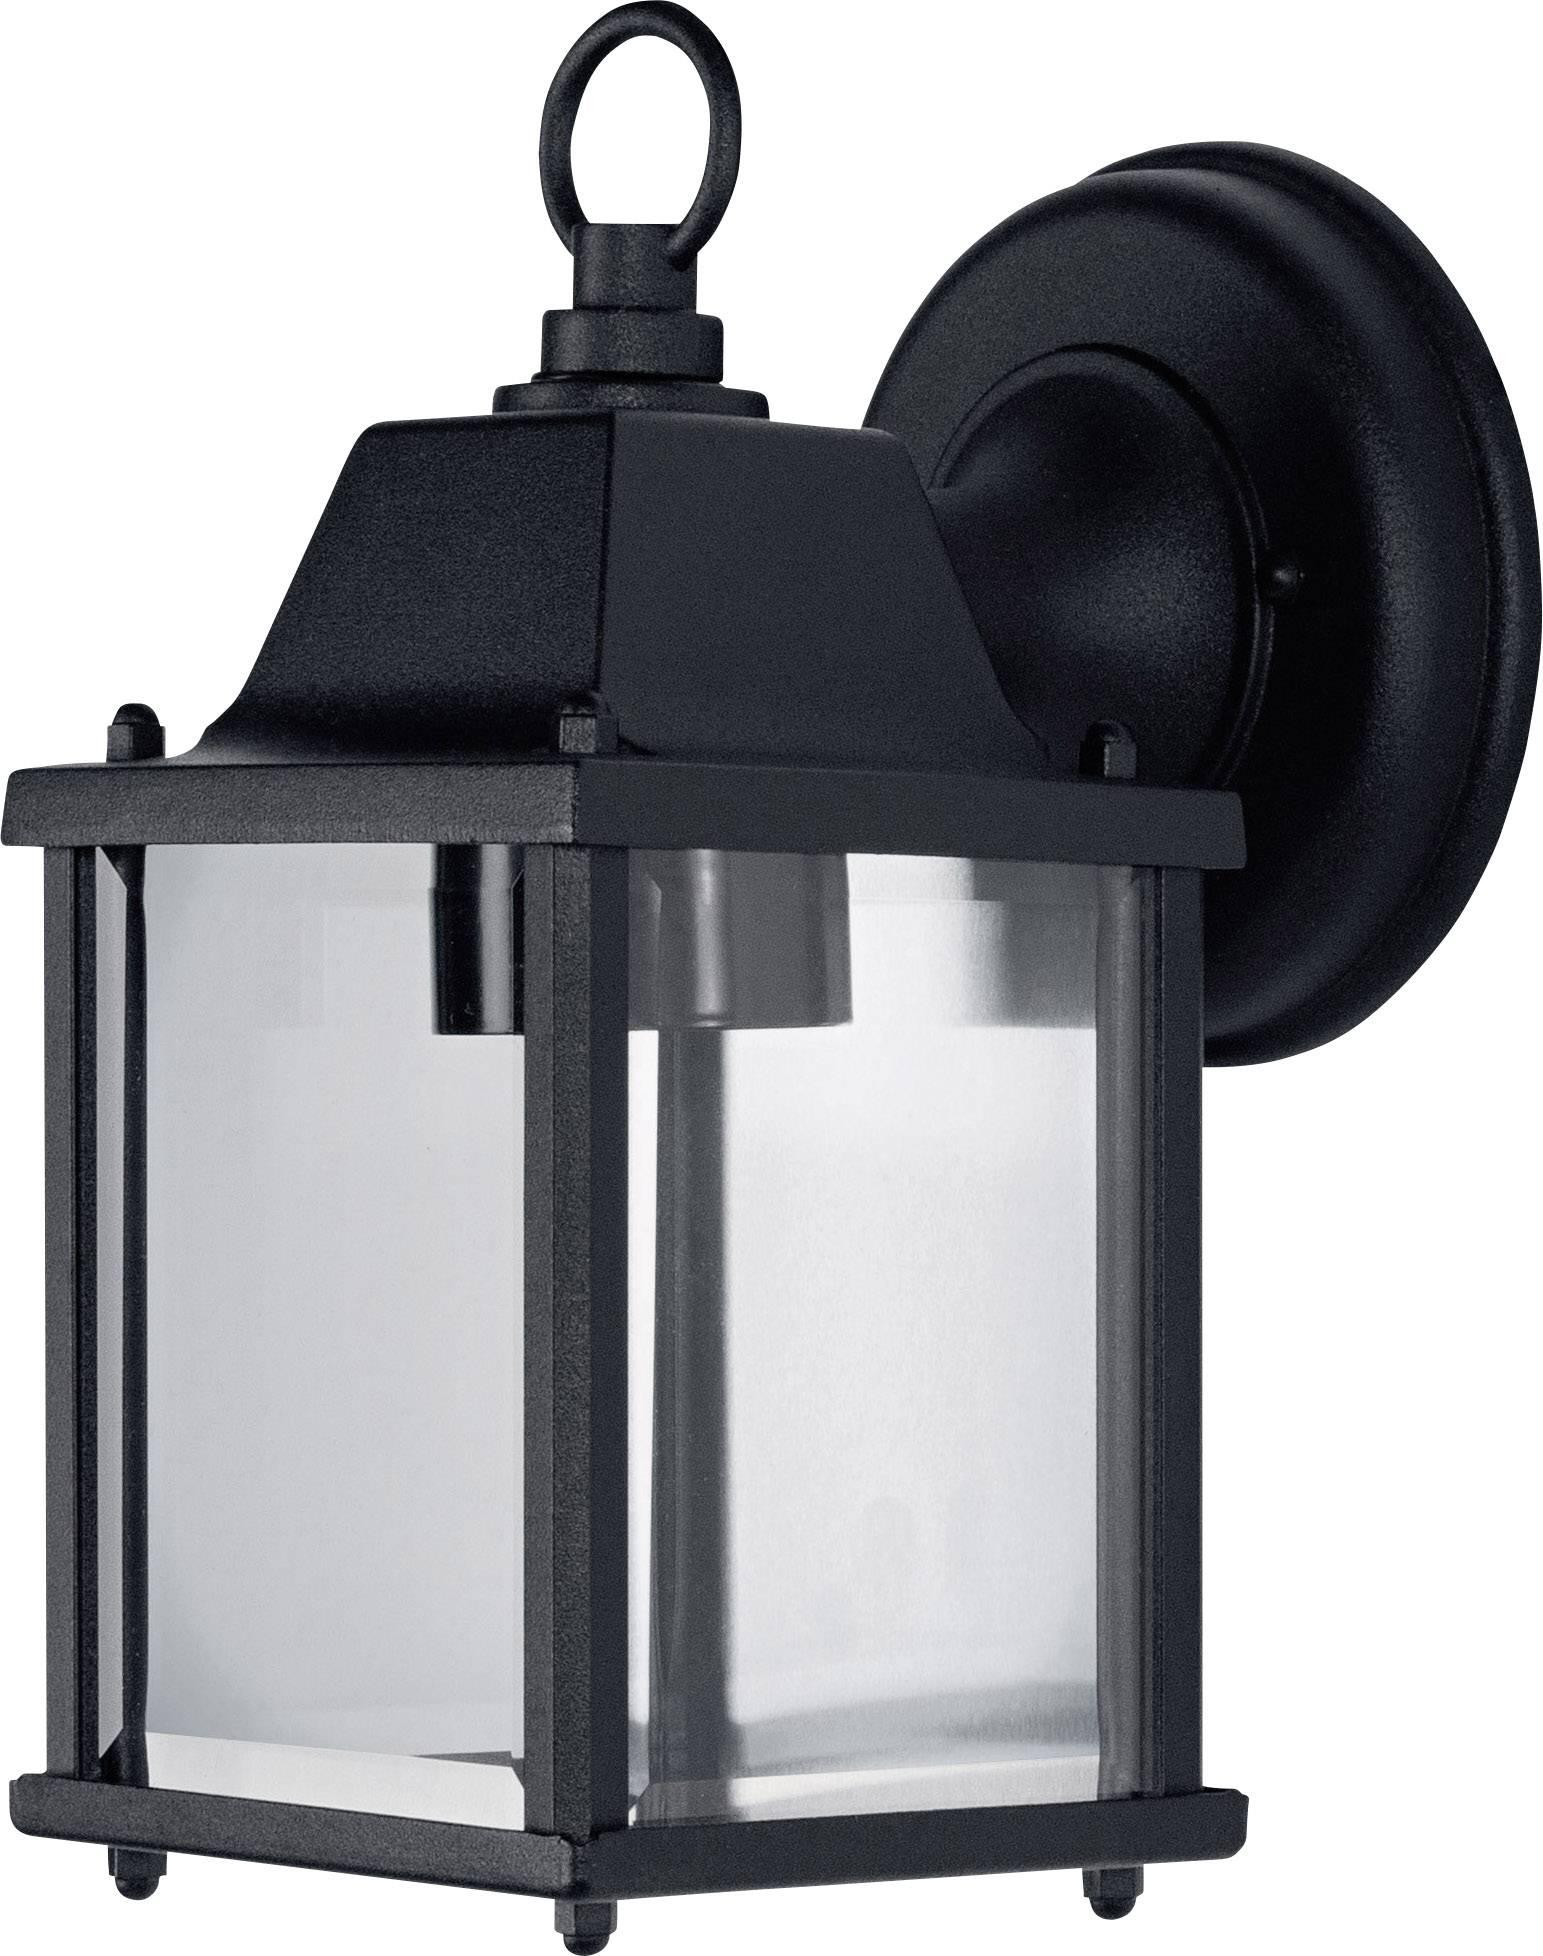 Extérieure 4058075139749 60 Noir S Endura® Murale E27 W Lantern Applique Classic Osram vm8PyN0Onw